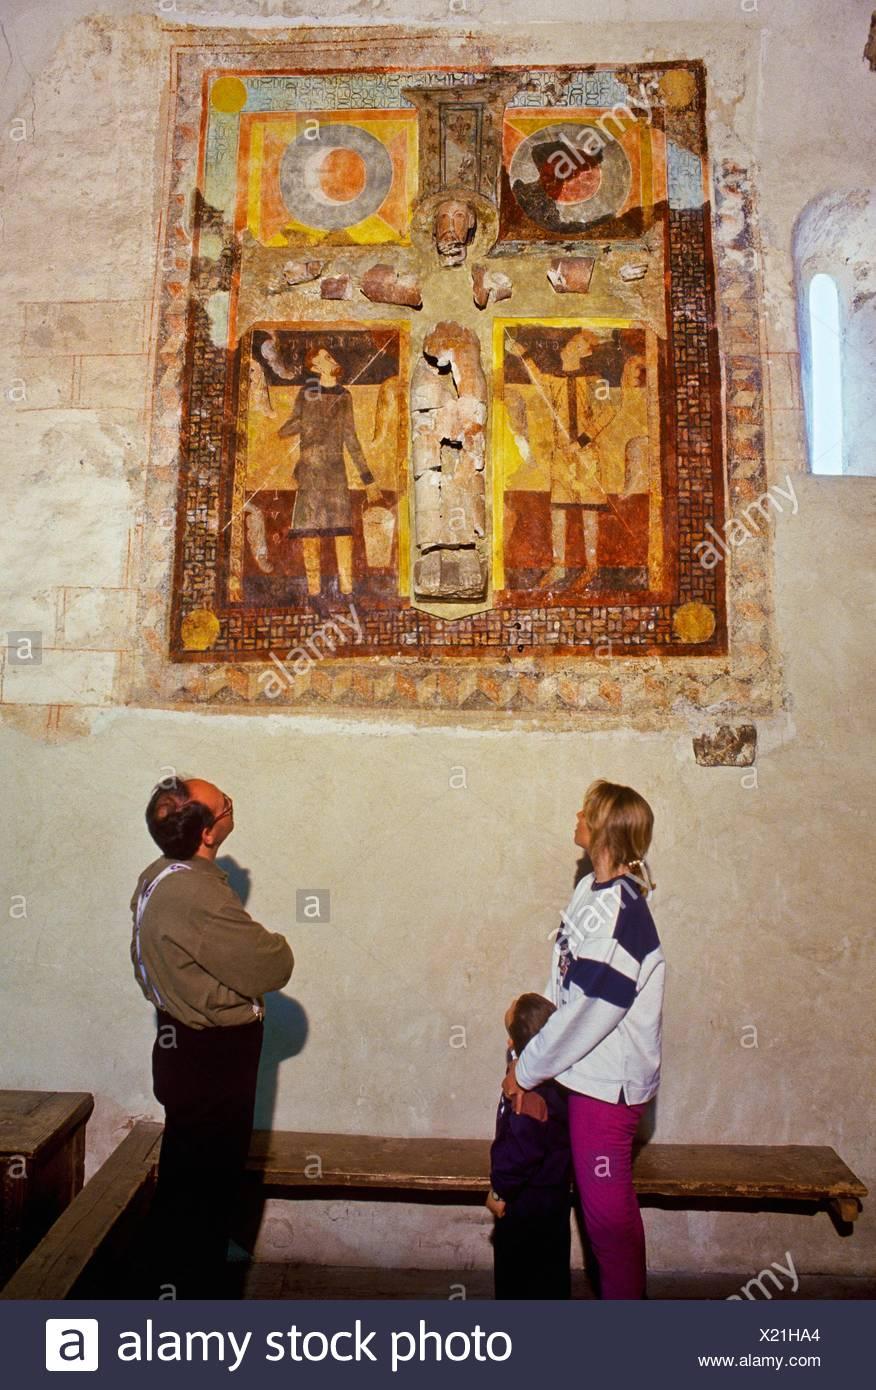 Remains of polychrome plaster Christ Romanesque church  Sant Joan de Caselles church, 12th century  Canillo  ANDORRA. - Stock Image